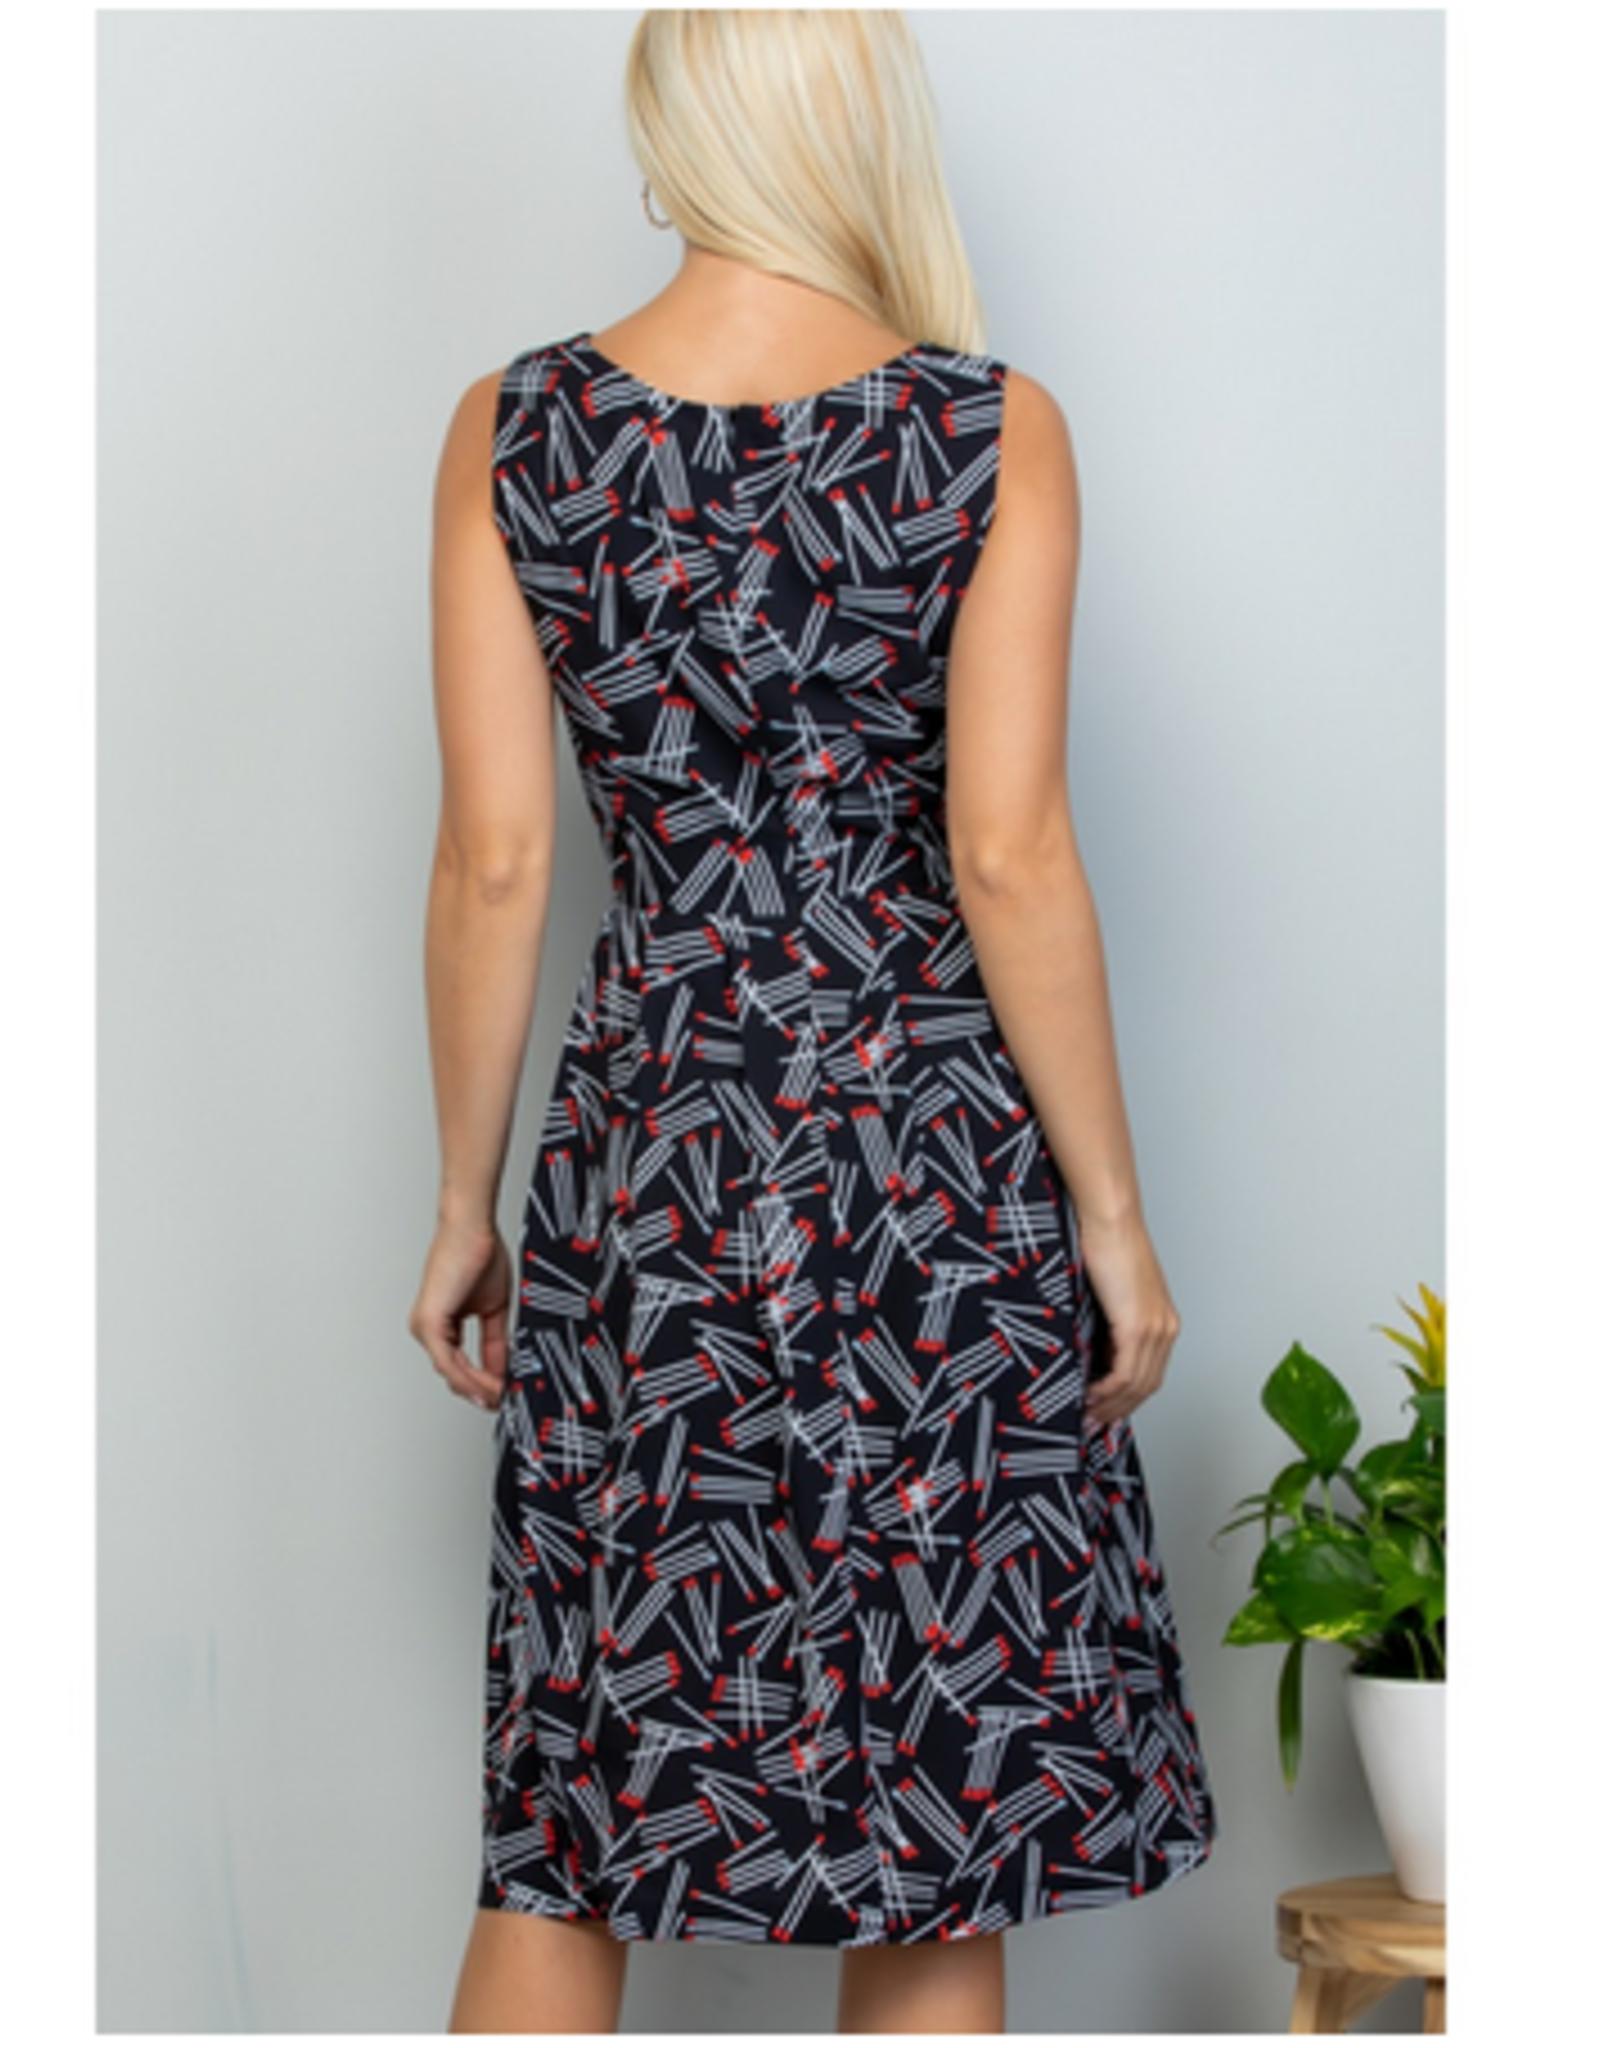 Match Stick Midi Dress